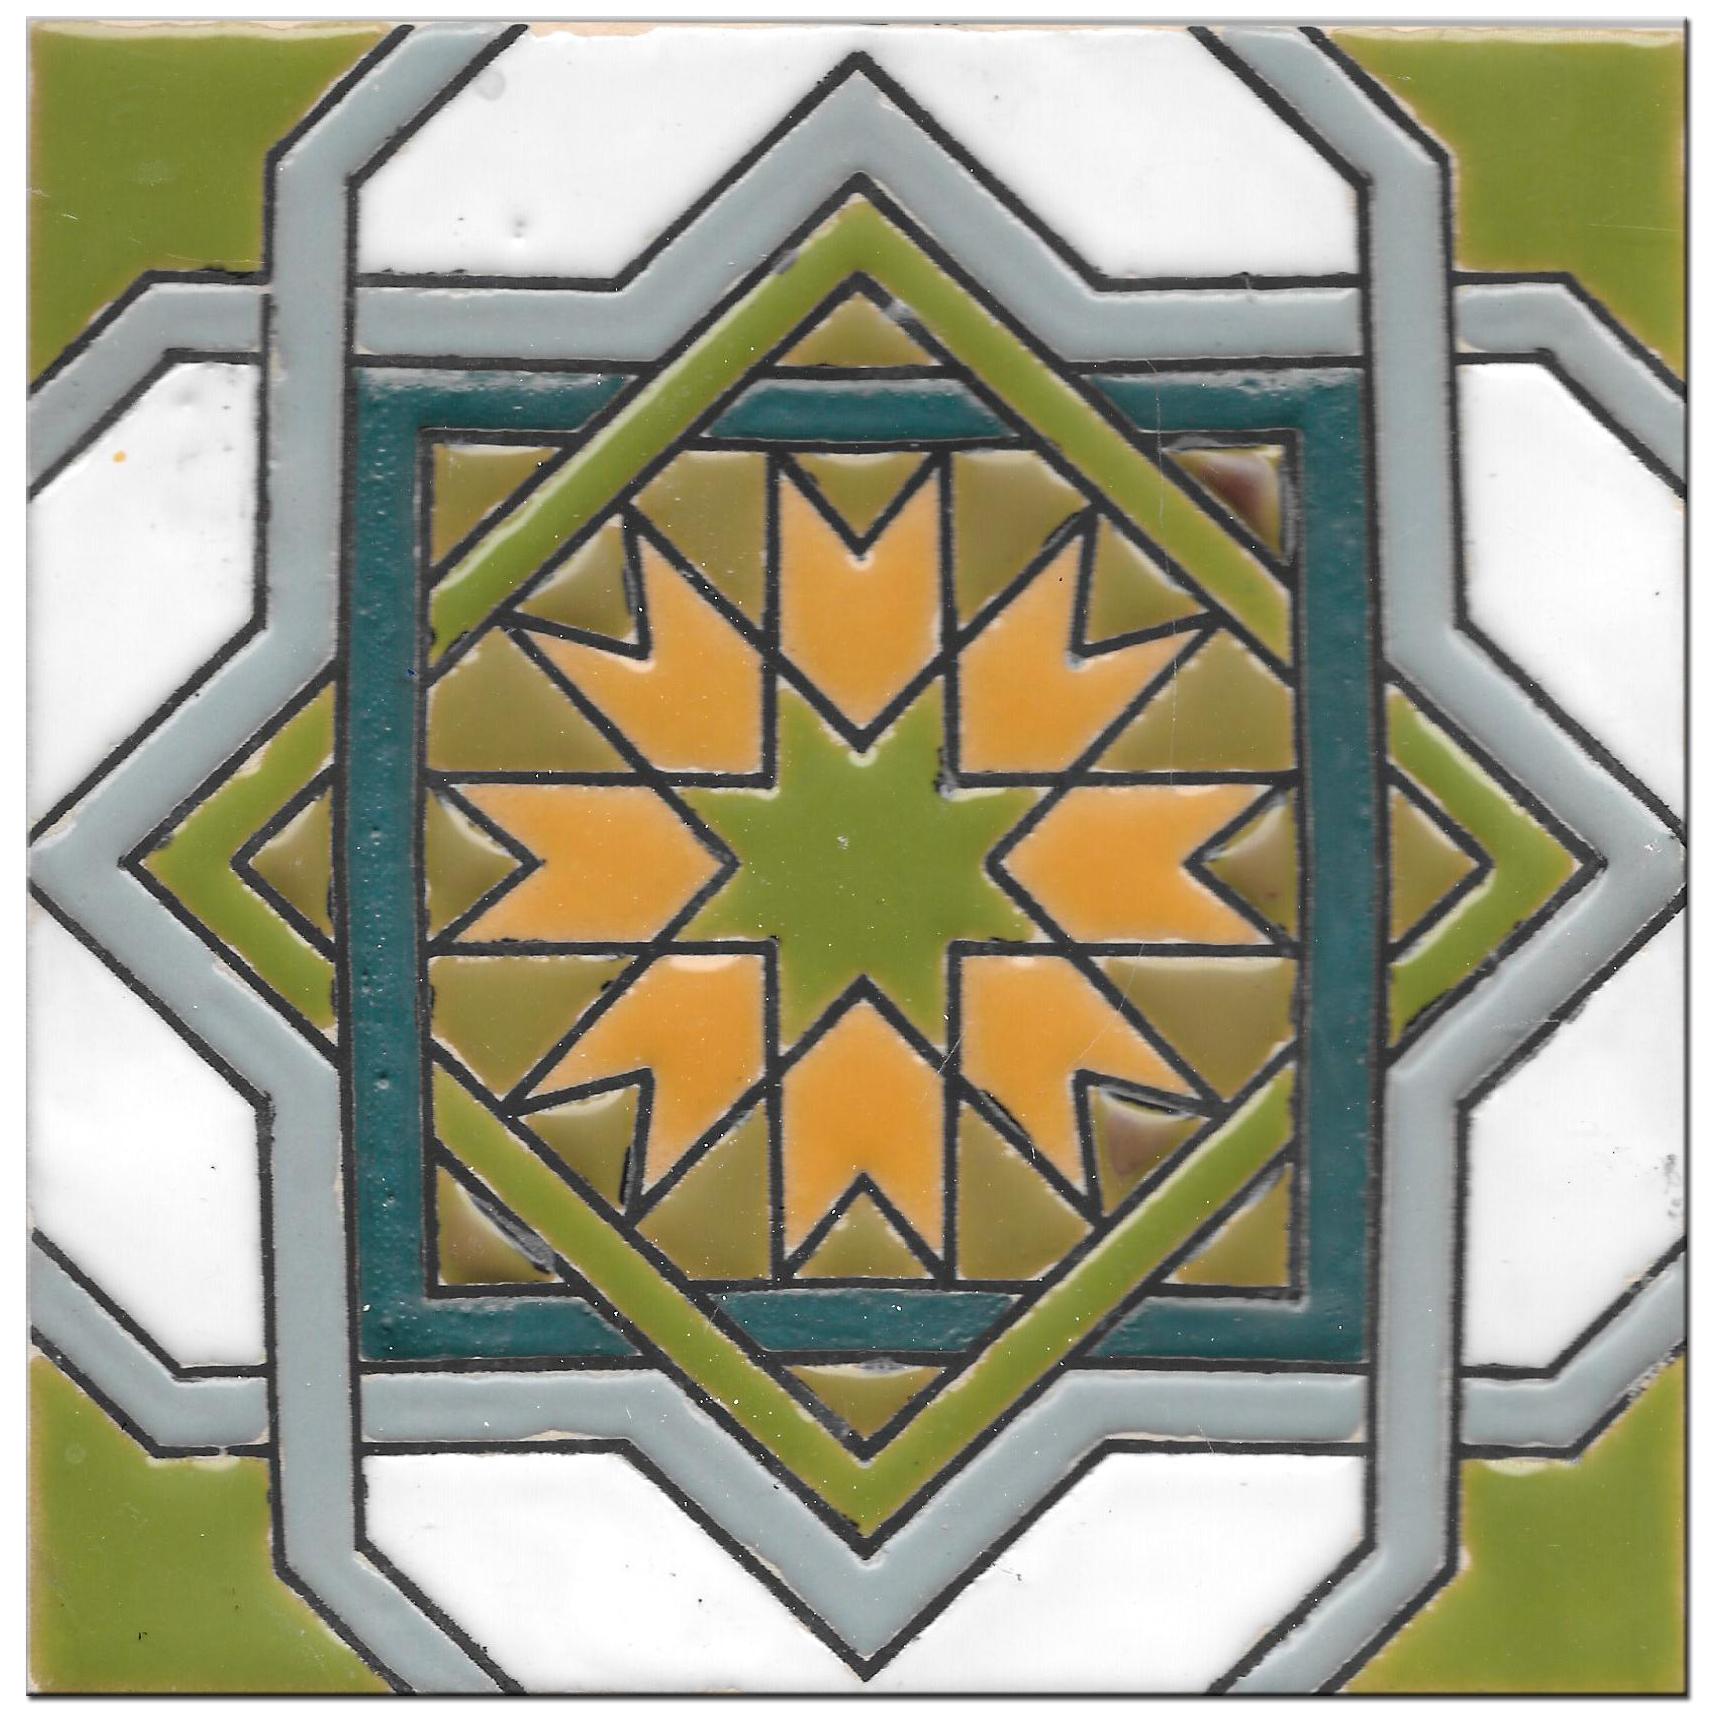 Carrelage à la main 14x14cm - Hispanic Arabic 3 - Color B